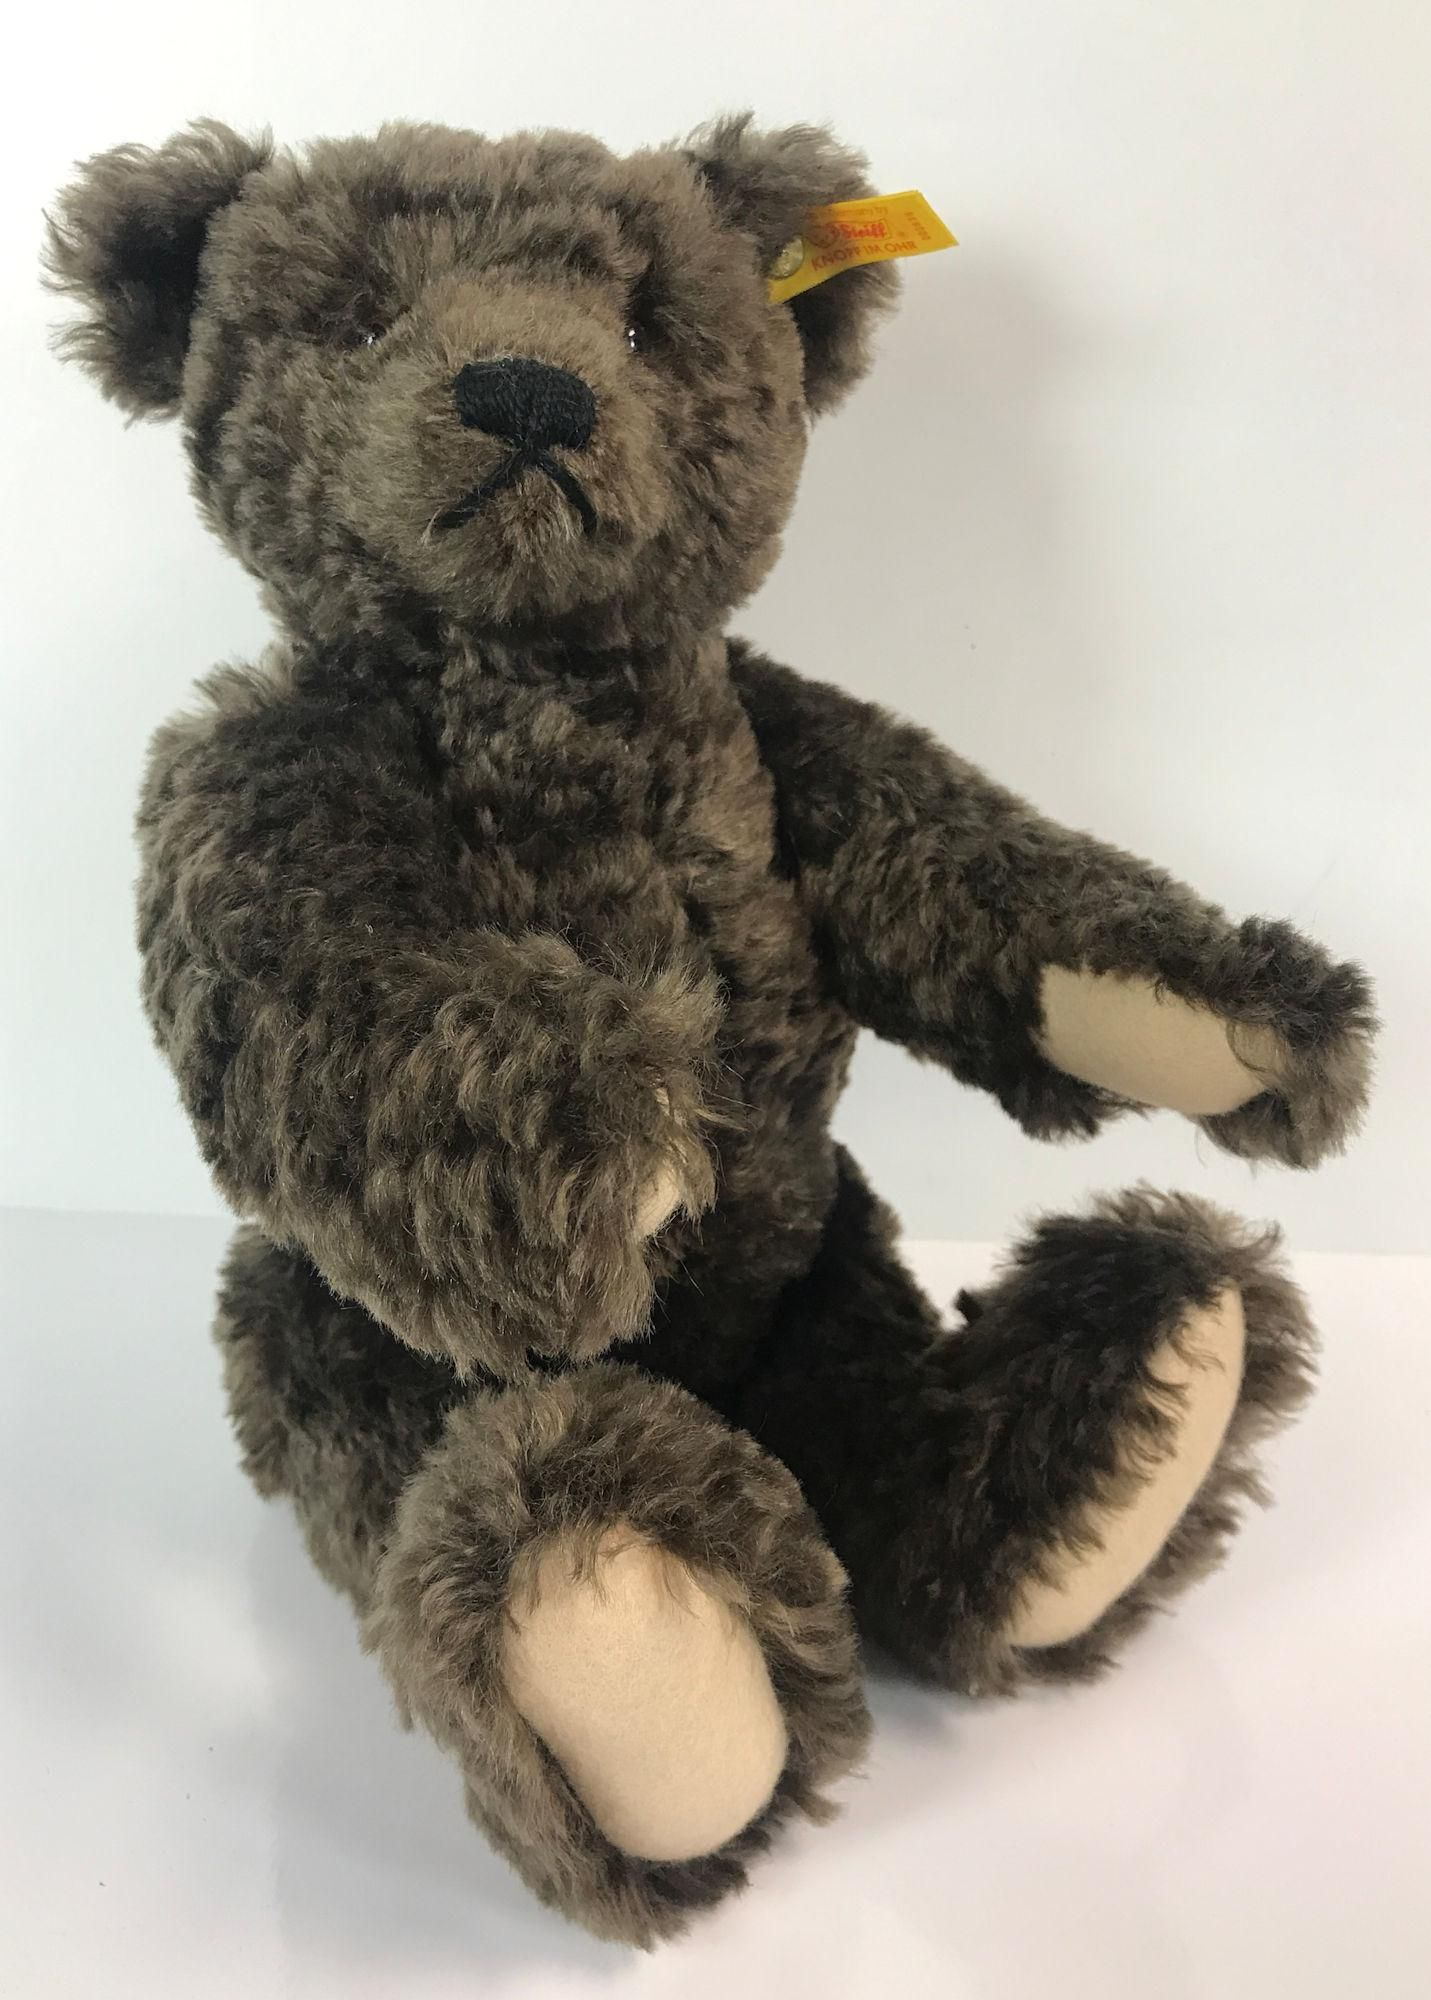 DARK BROWN CURLY MOHAIR STEIFF TEDDY BEAR. DISK JOINTED